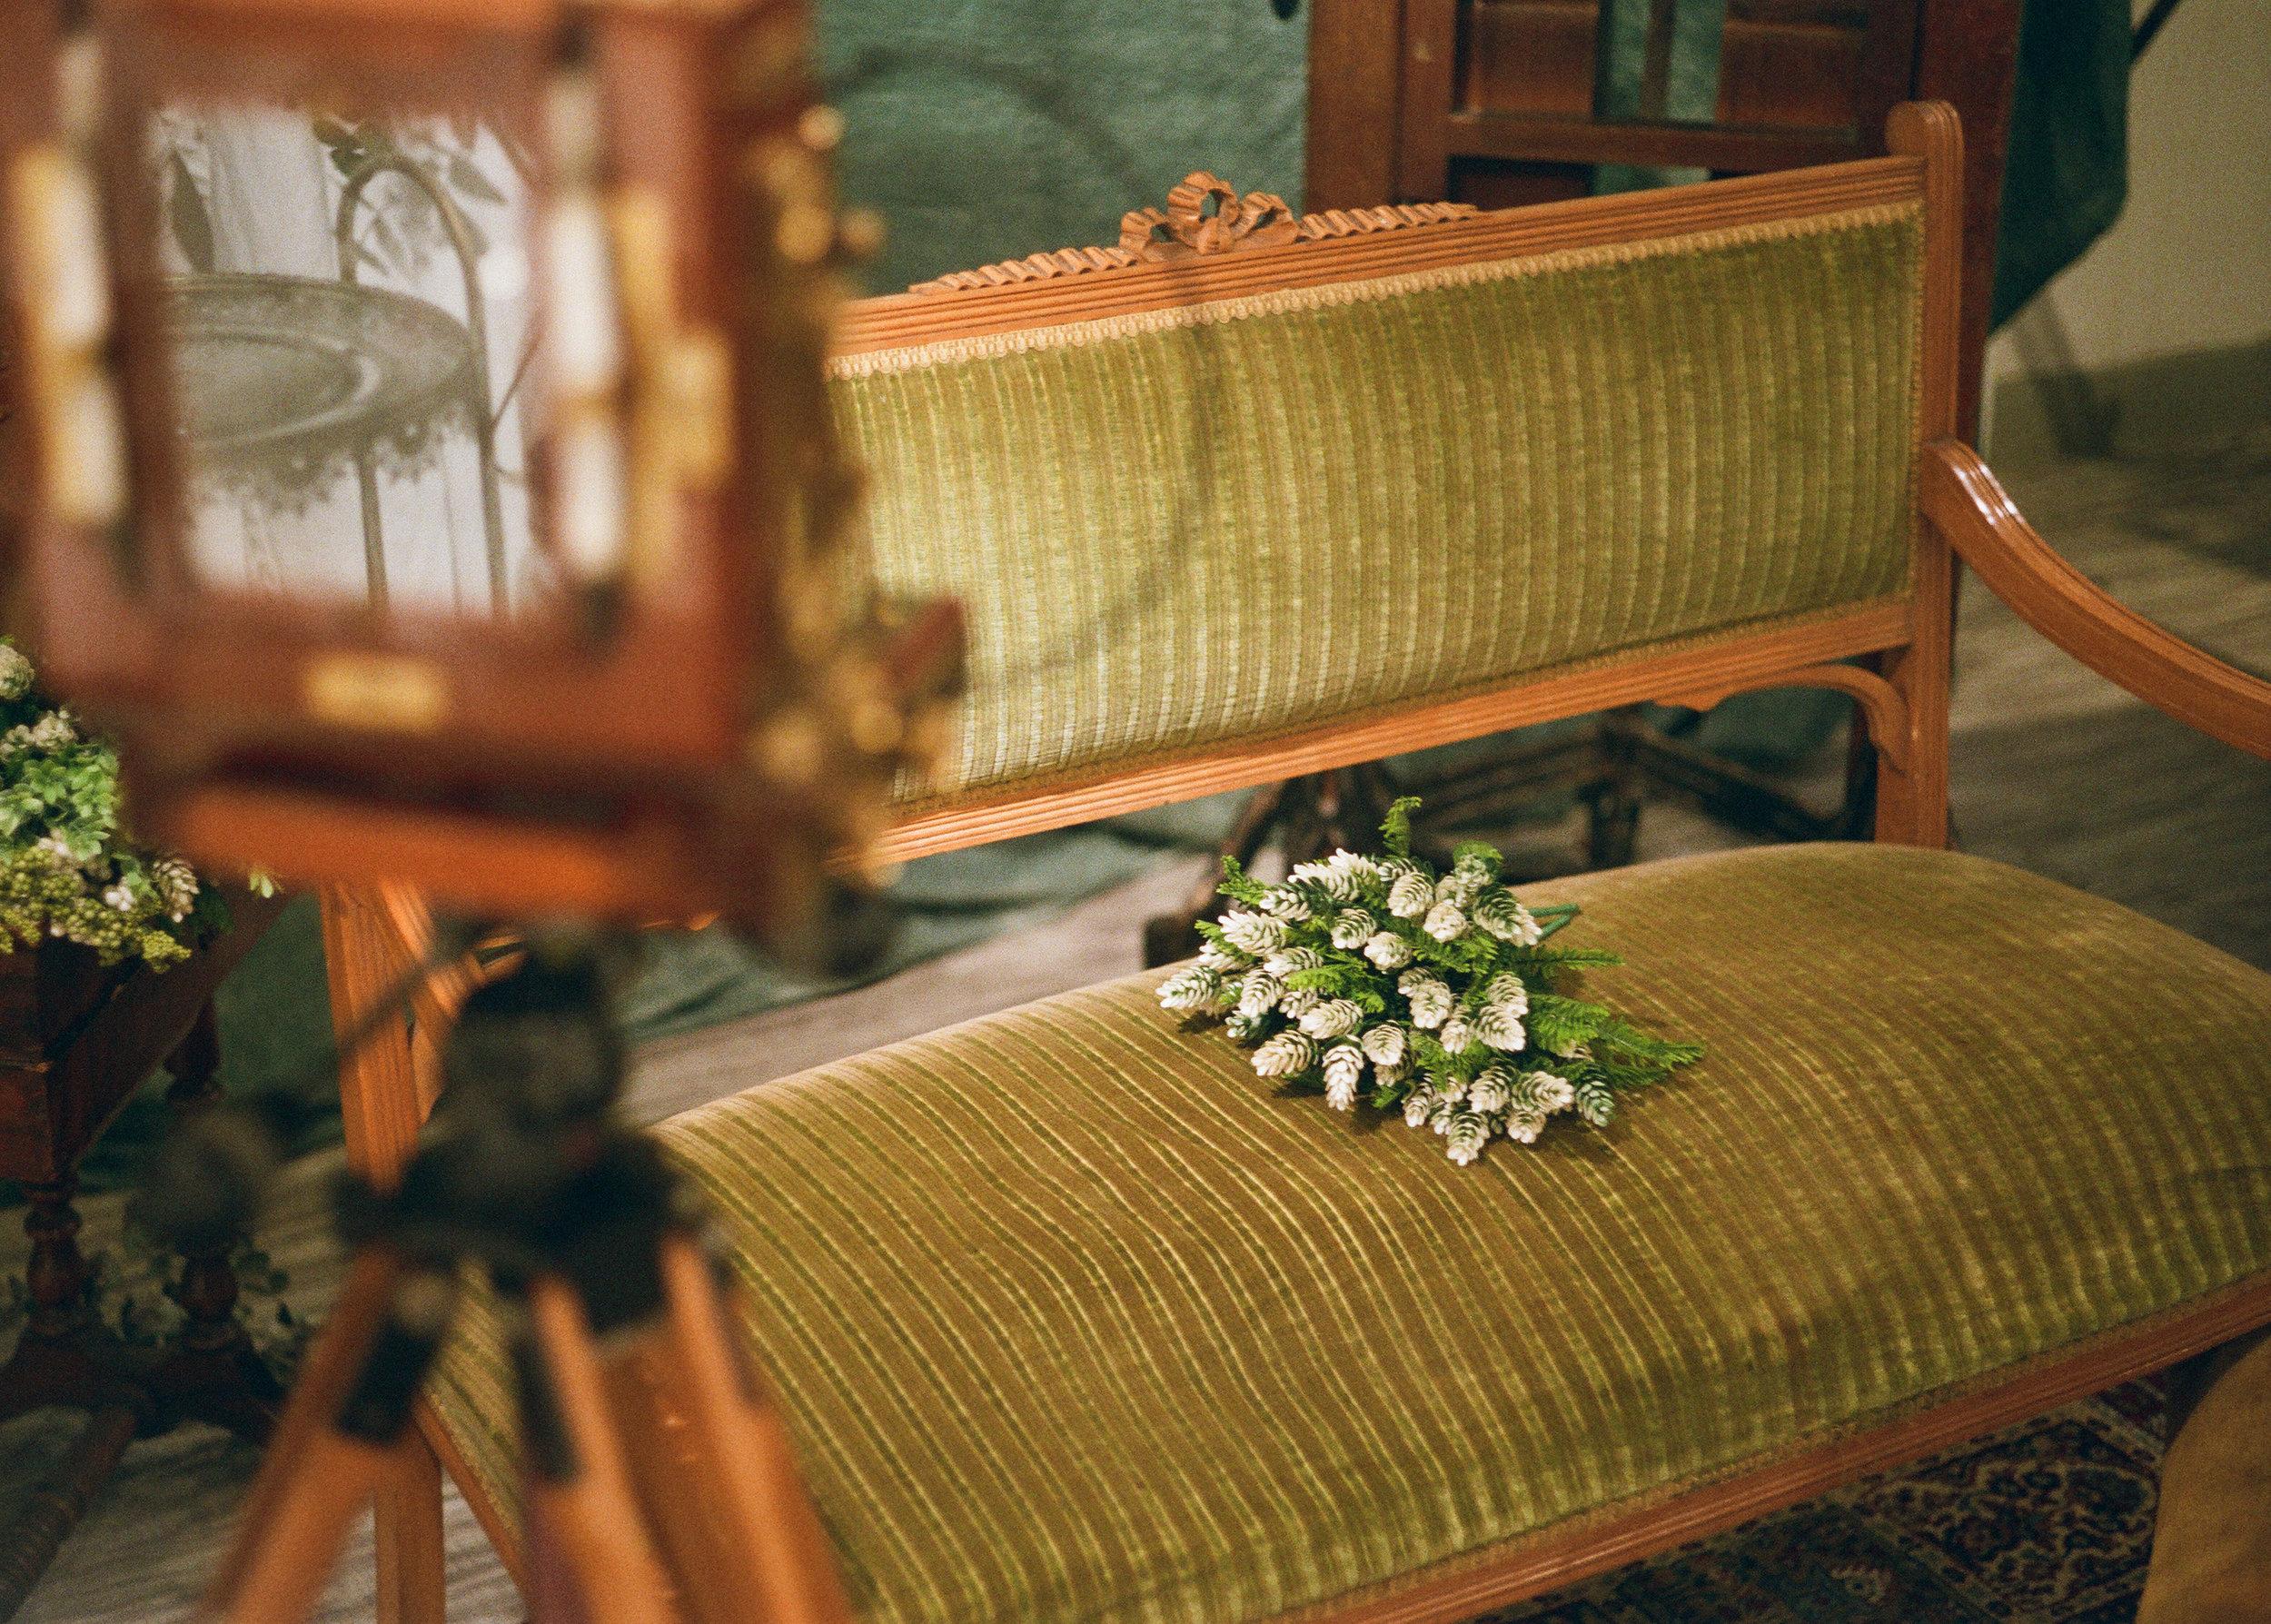 ANTIQUE PHOTO STUDIO - 古寫真館於法國古董店 Parc古道具公園 內過百年的法國古董傢具襯托下,與親人、朋友體驗傳統攝影工藝。感受照片呈現的瞬間,將回憶化為最佳紀念禮物。